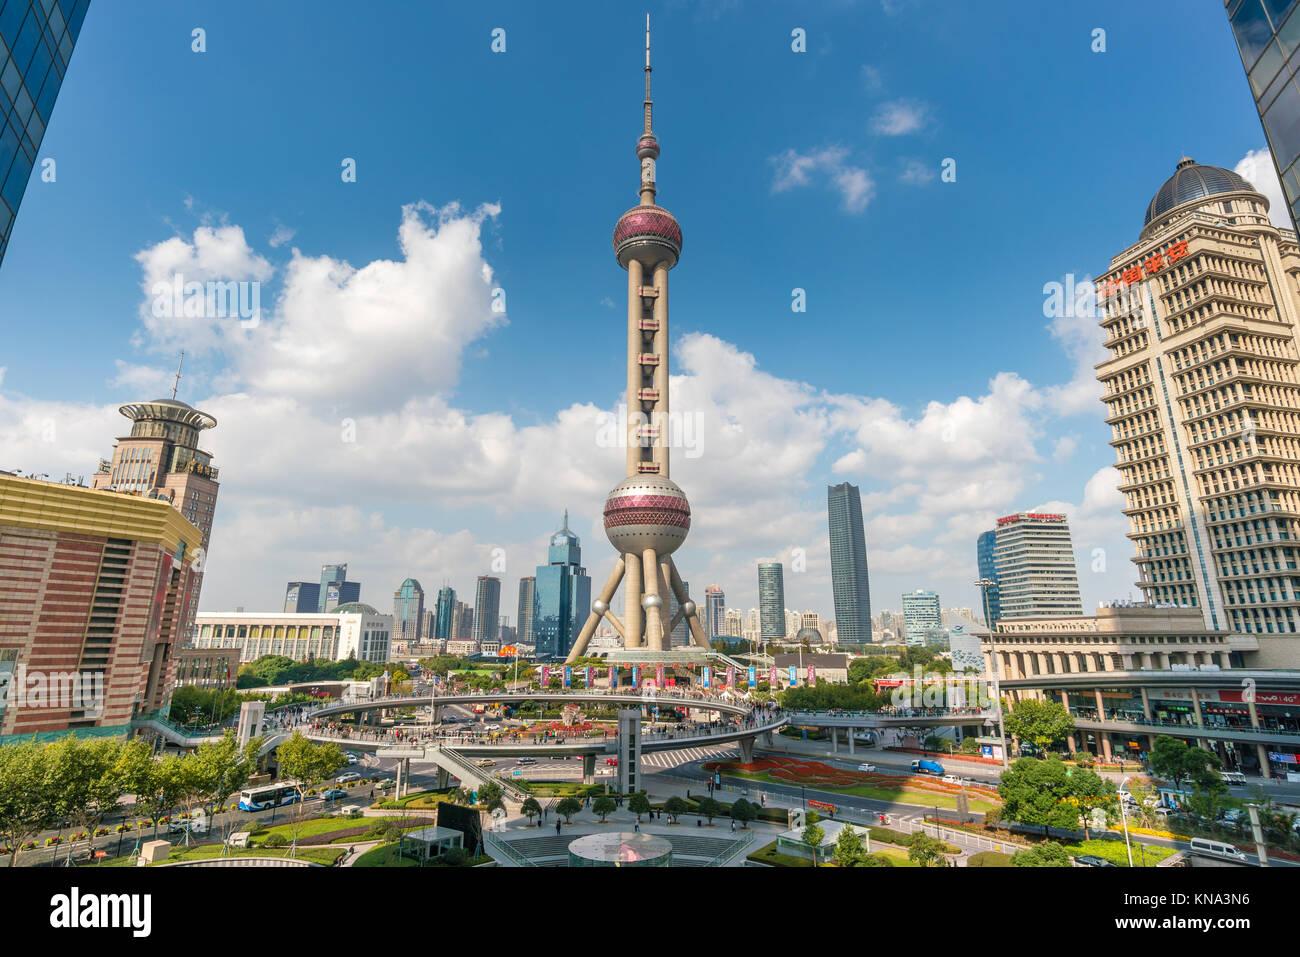 Oriental Pearl Tower in Shanghai - Stock Image